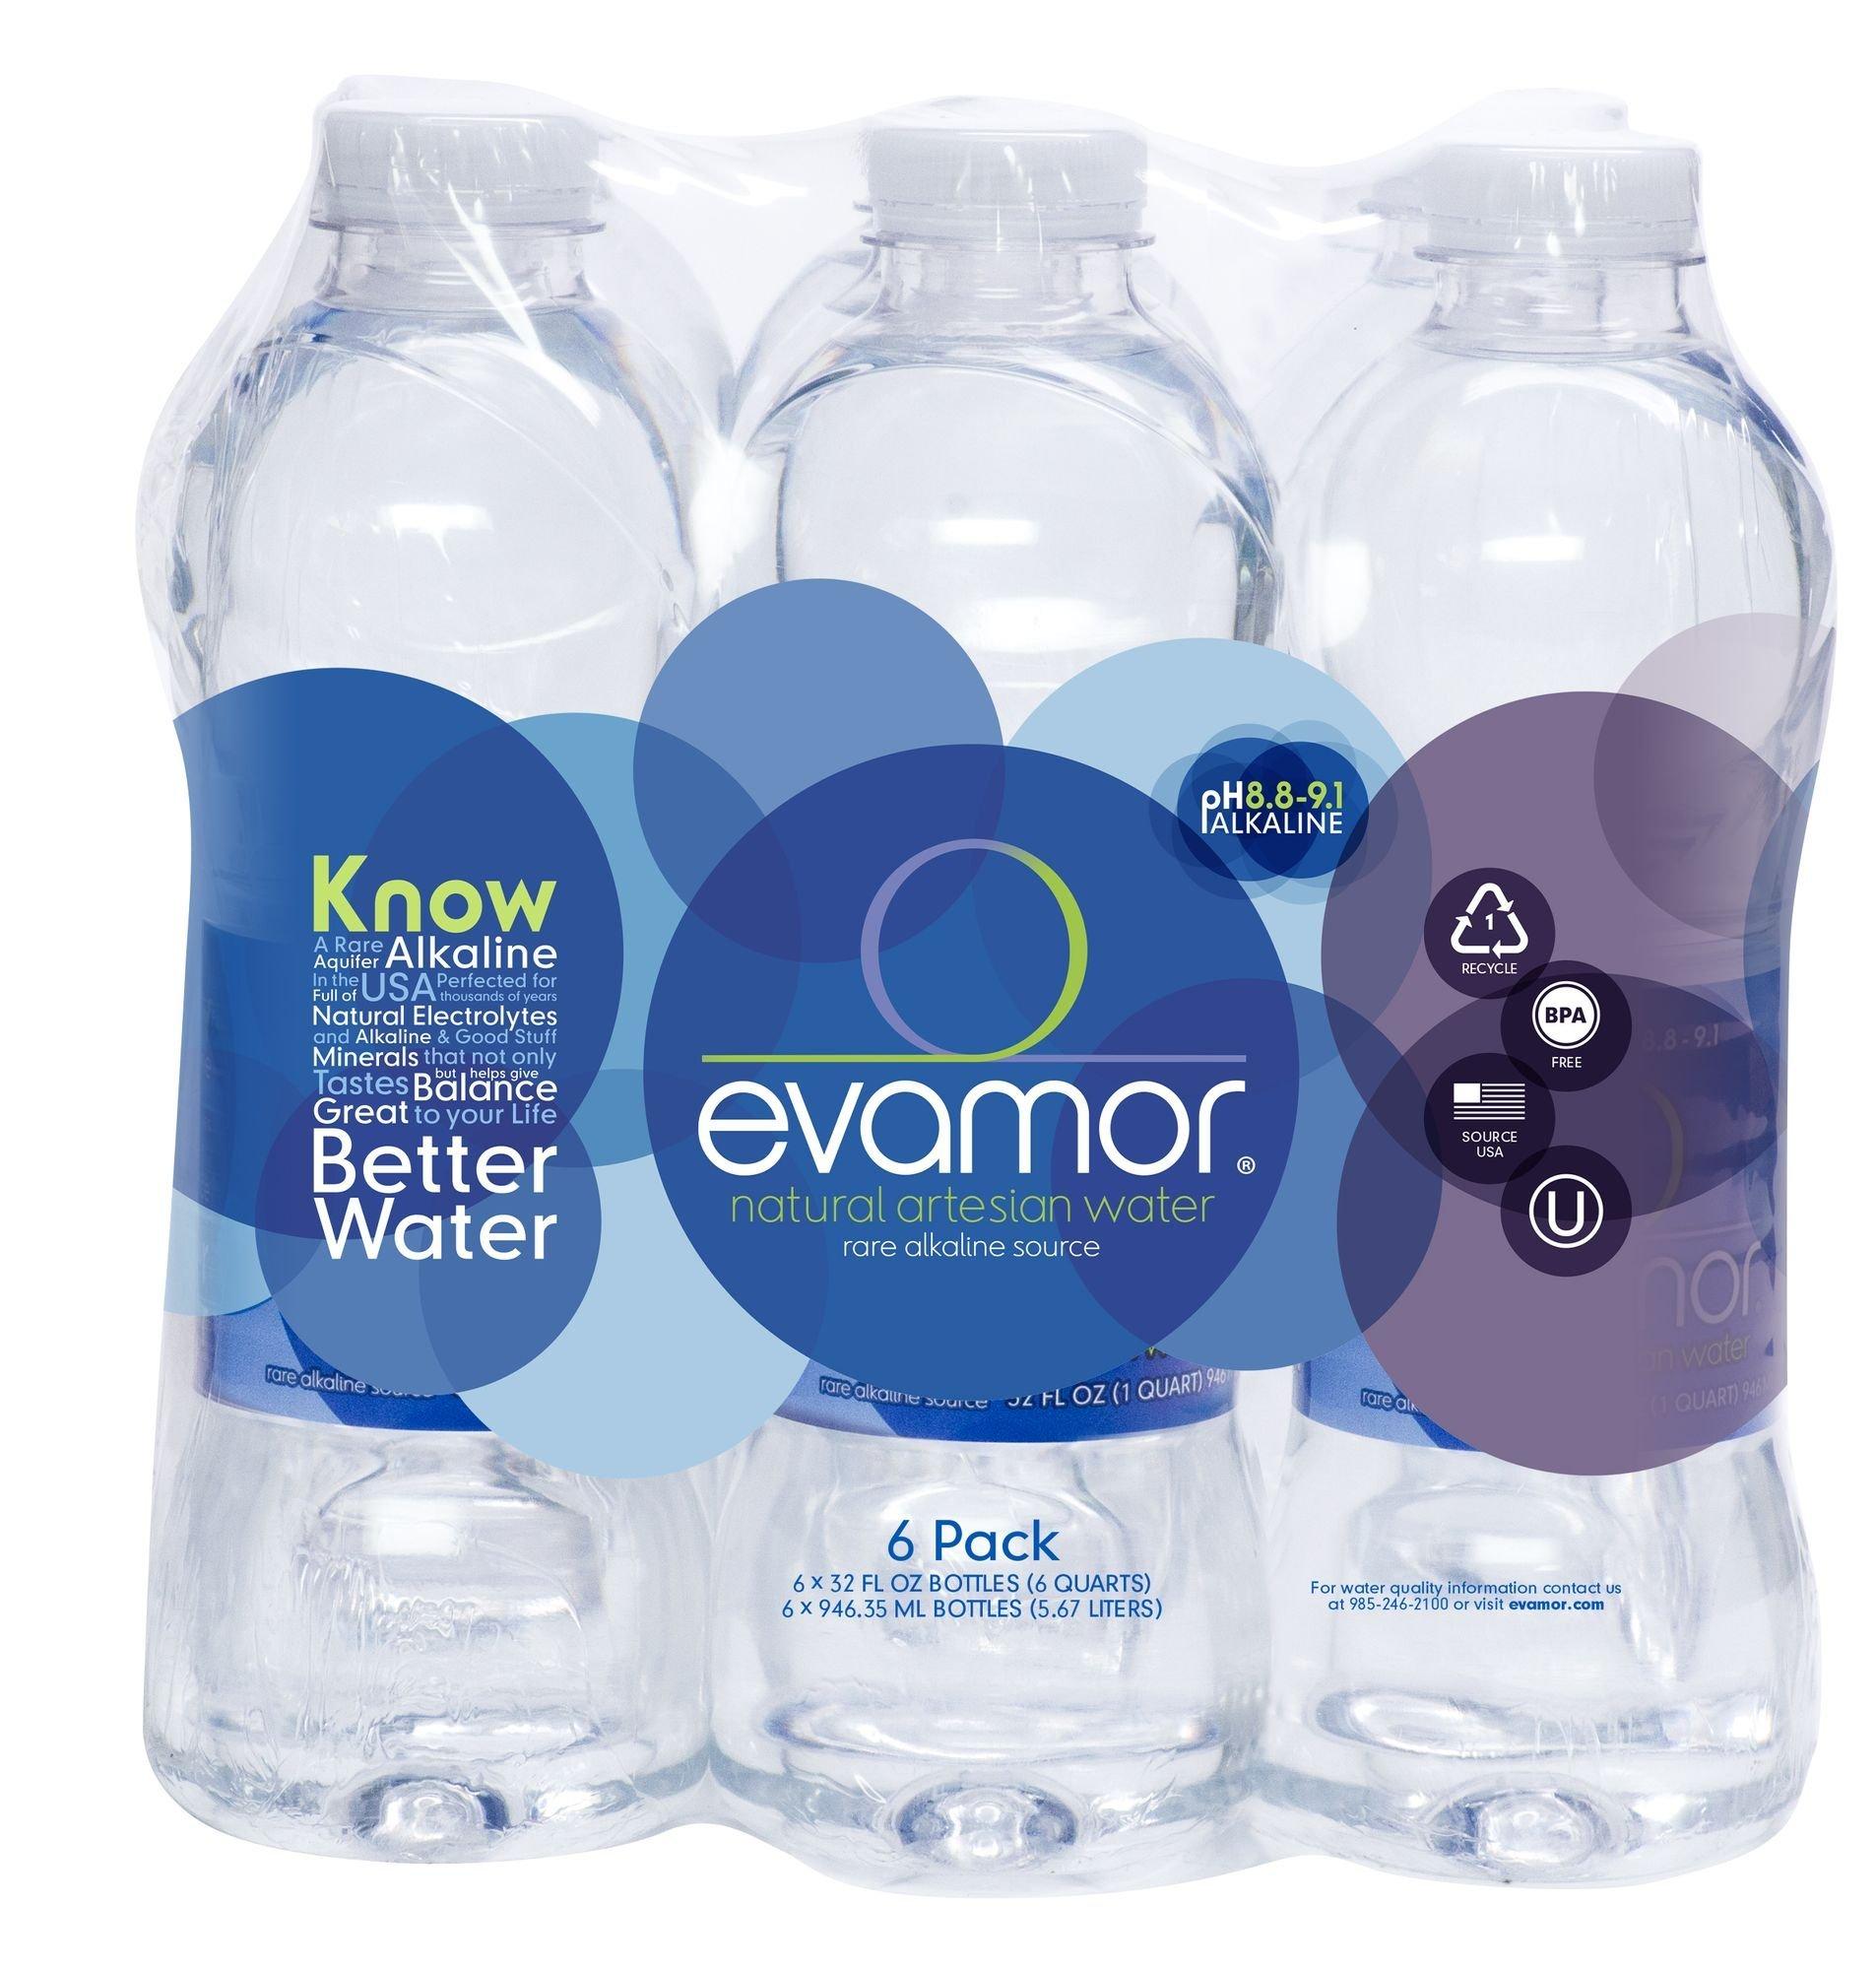 What Is Natural Alkaline Artesian Water